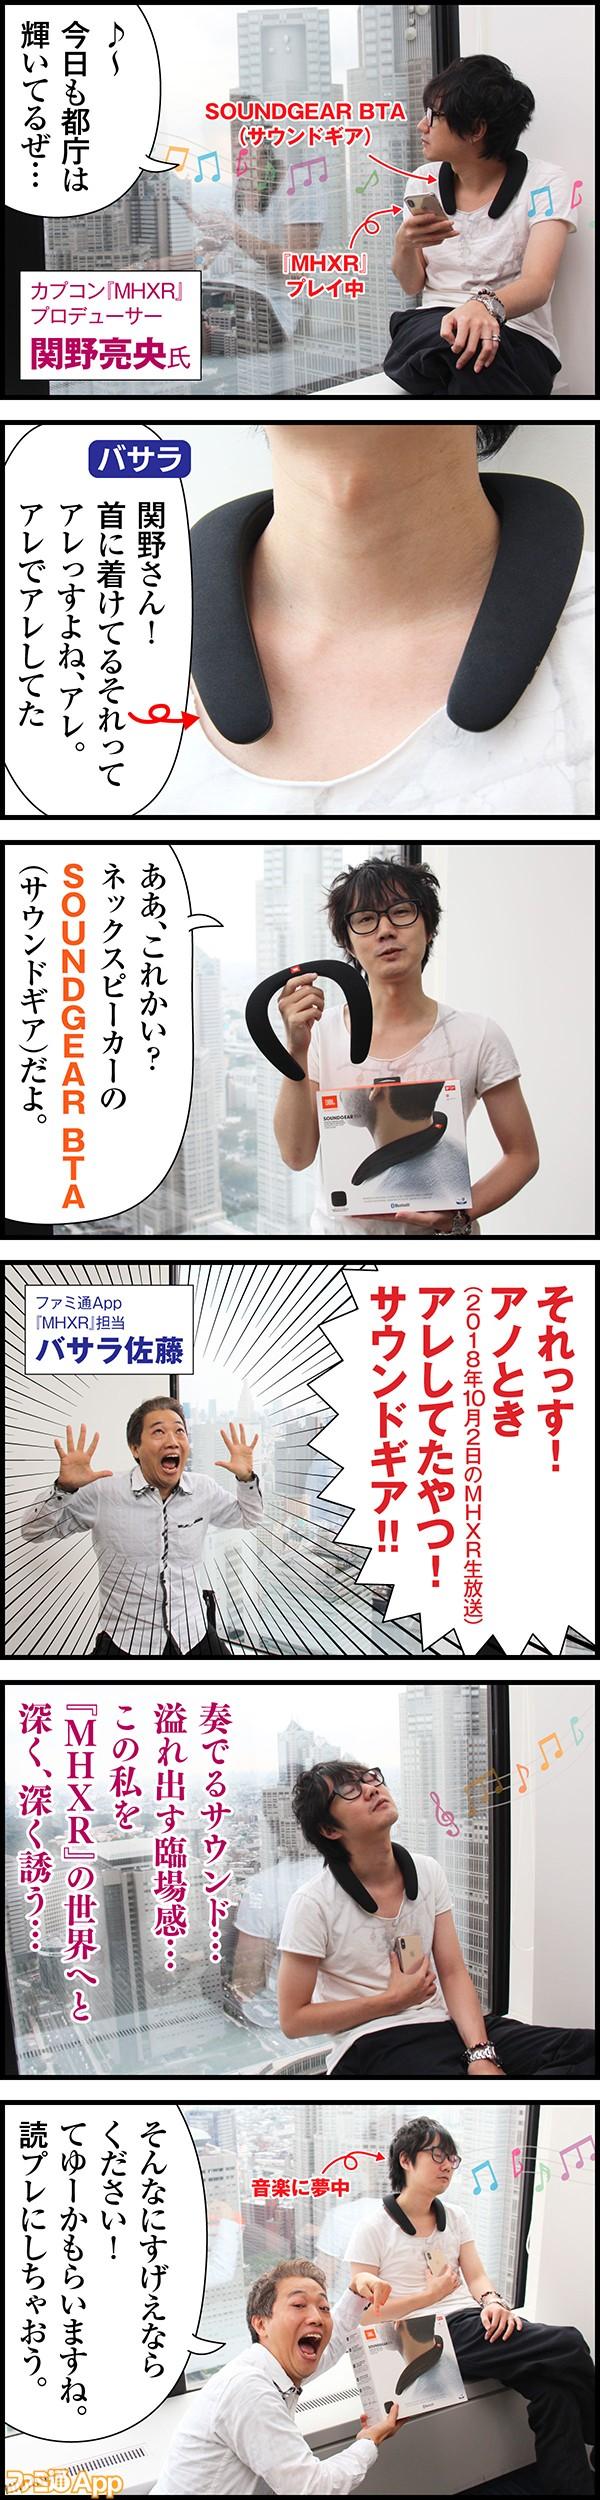 manga_MHXR_181024-600